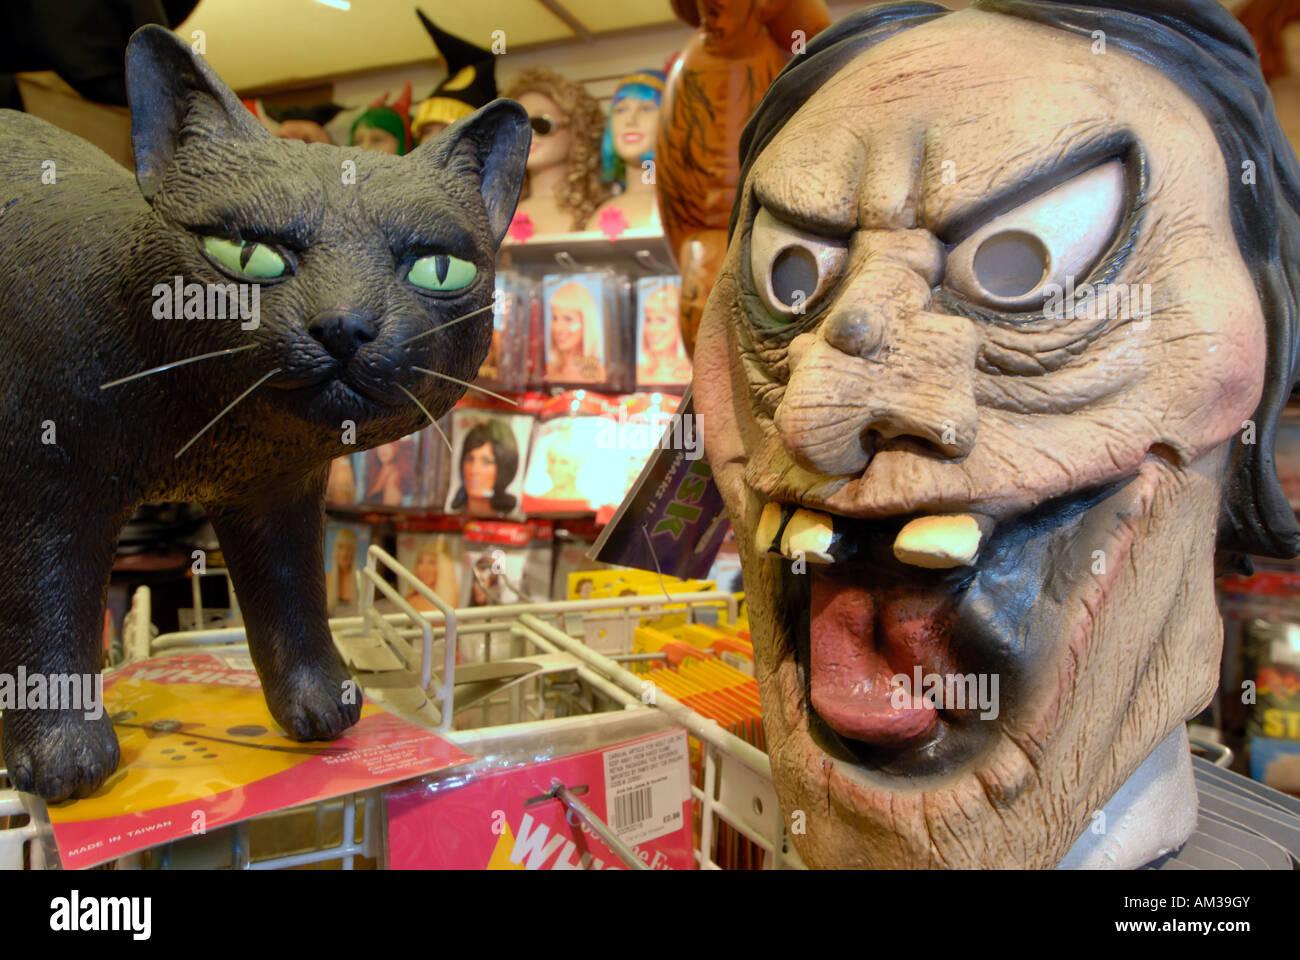 mask and a cat halloween party items at aha ha ha jokes ...